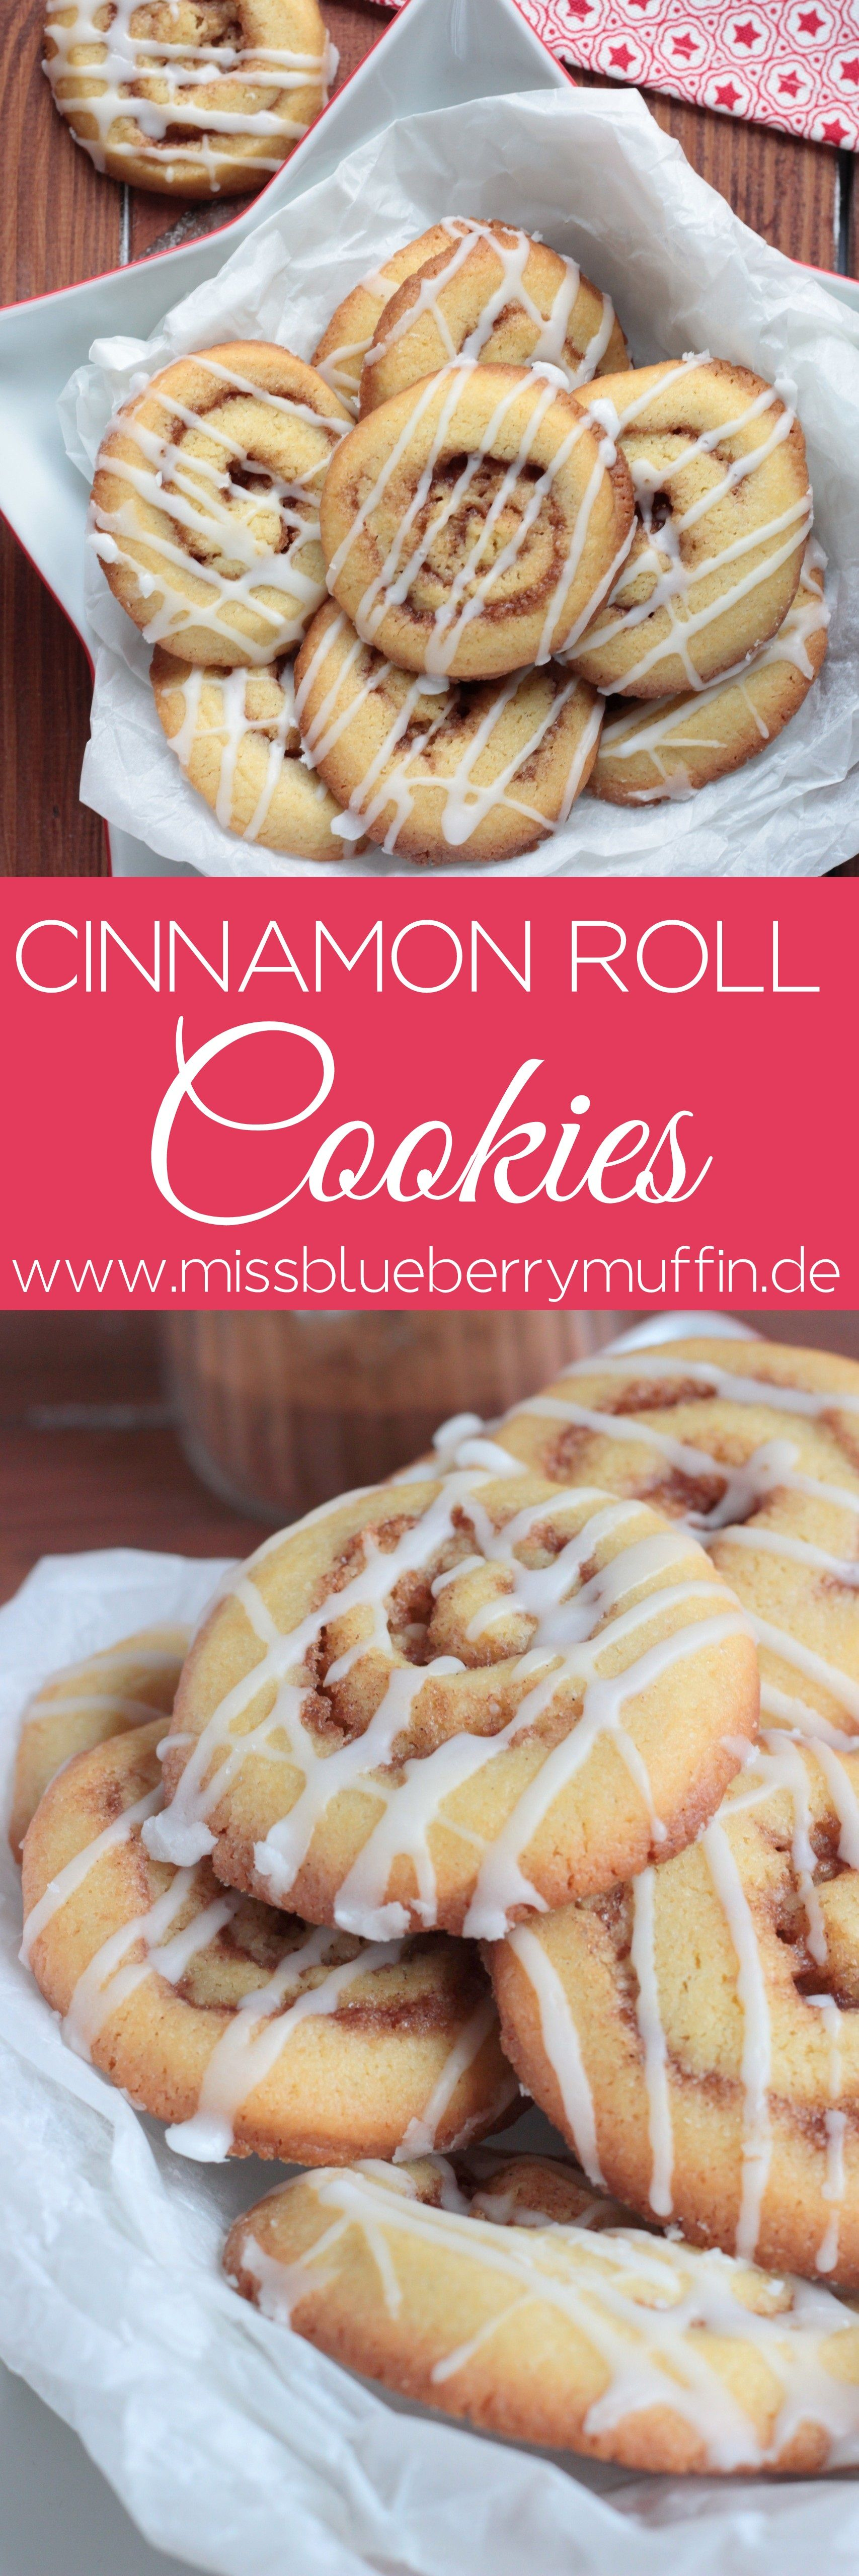 Zimtschnecken Kekse // Cinnamon Roll Cookies <3 #starbuckscake